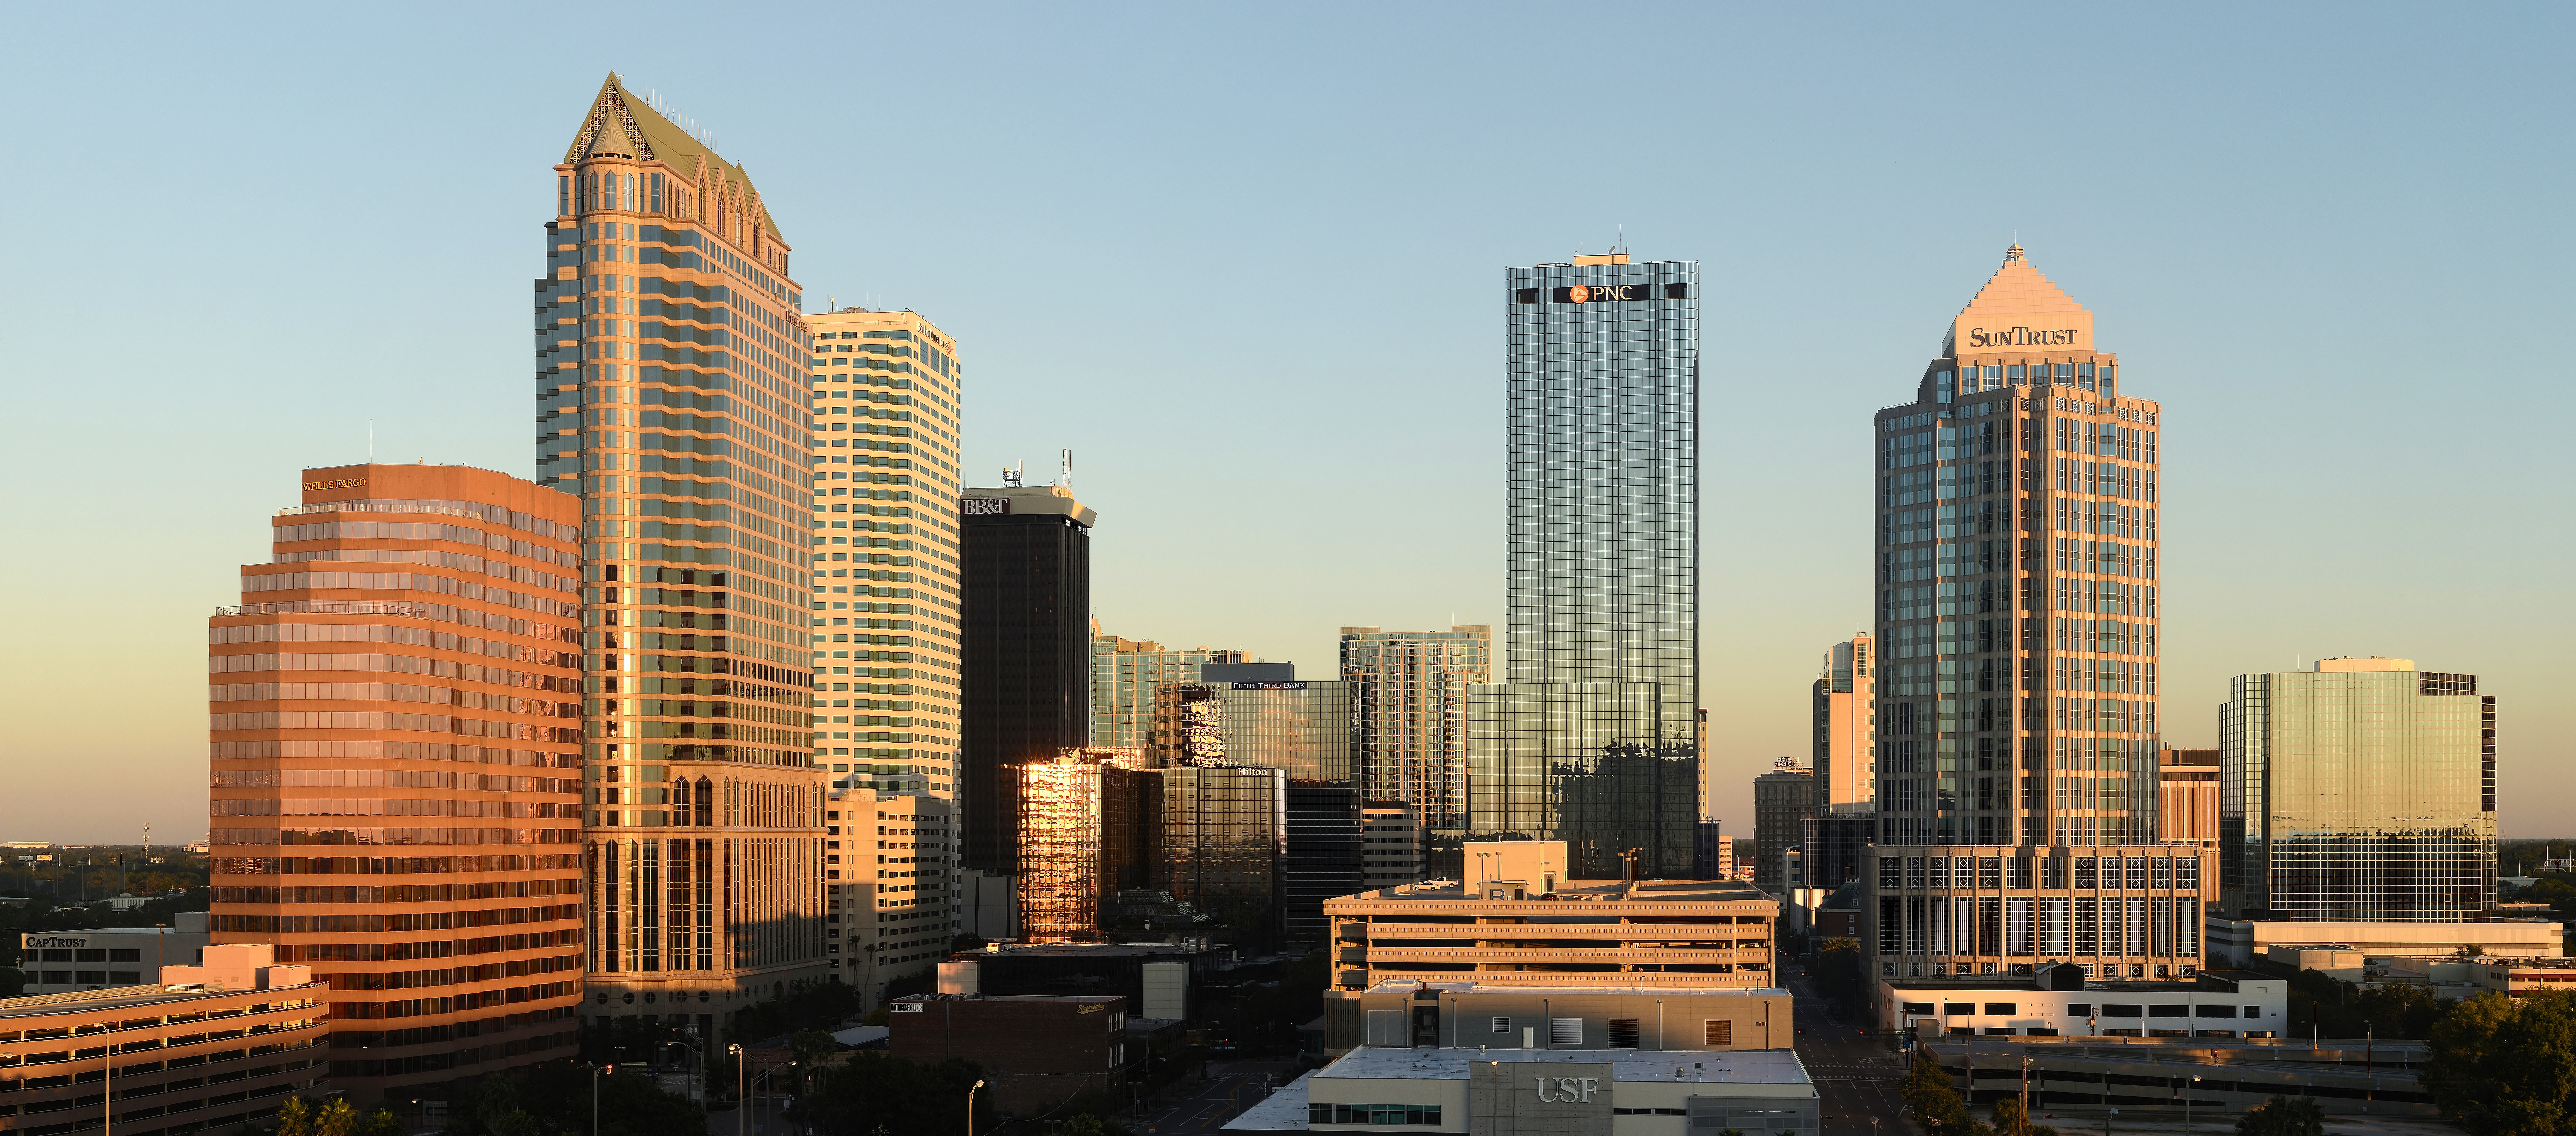 Cityscape of Tampa, Florida - Wikipedia